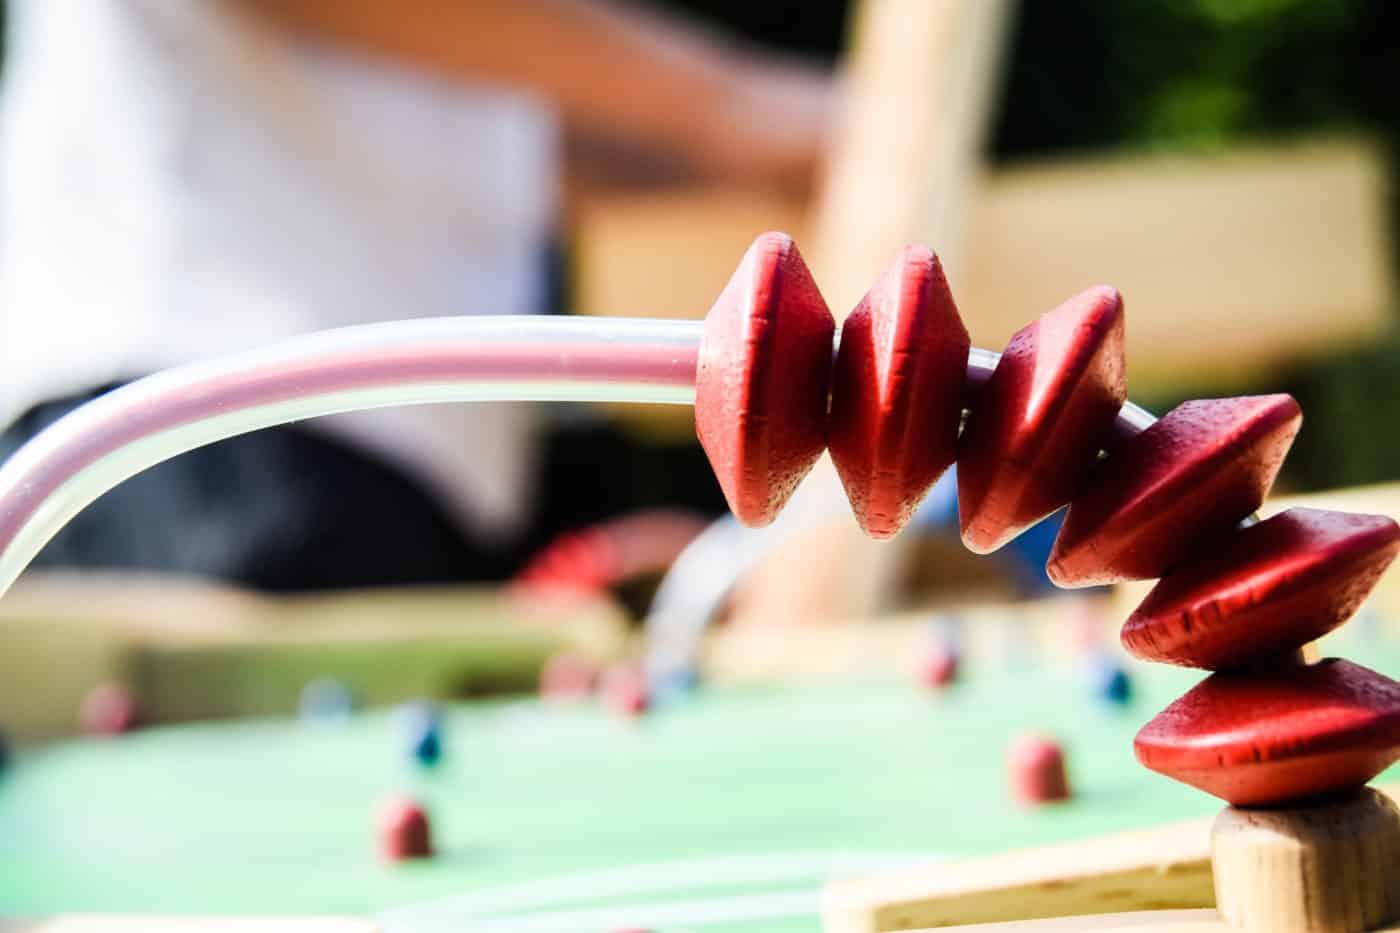 Flipper voetbal - Oud Hollandse spelletjes